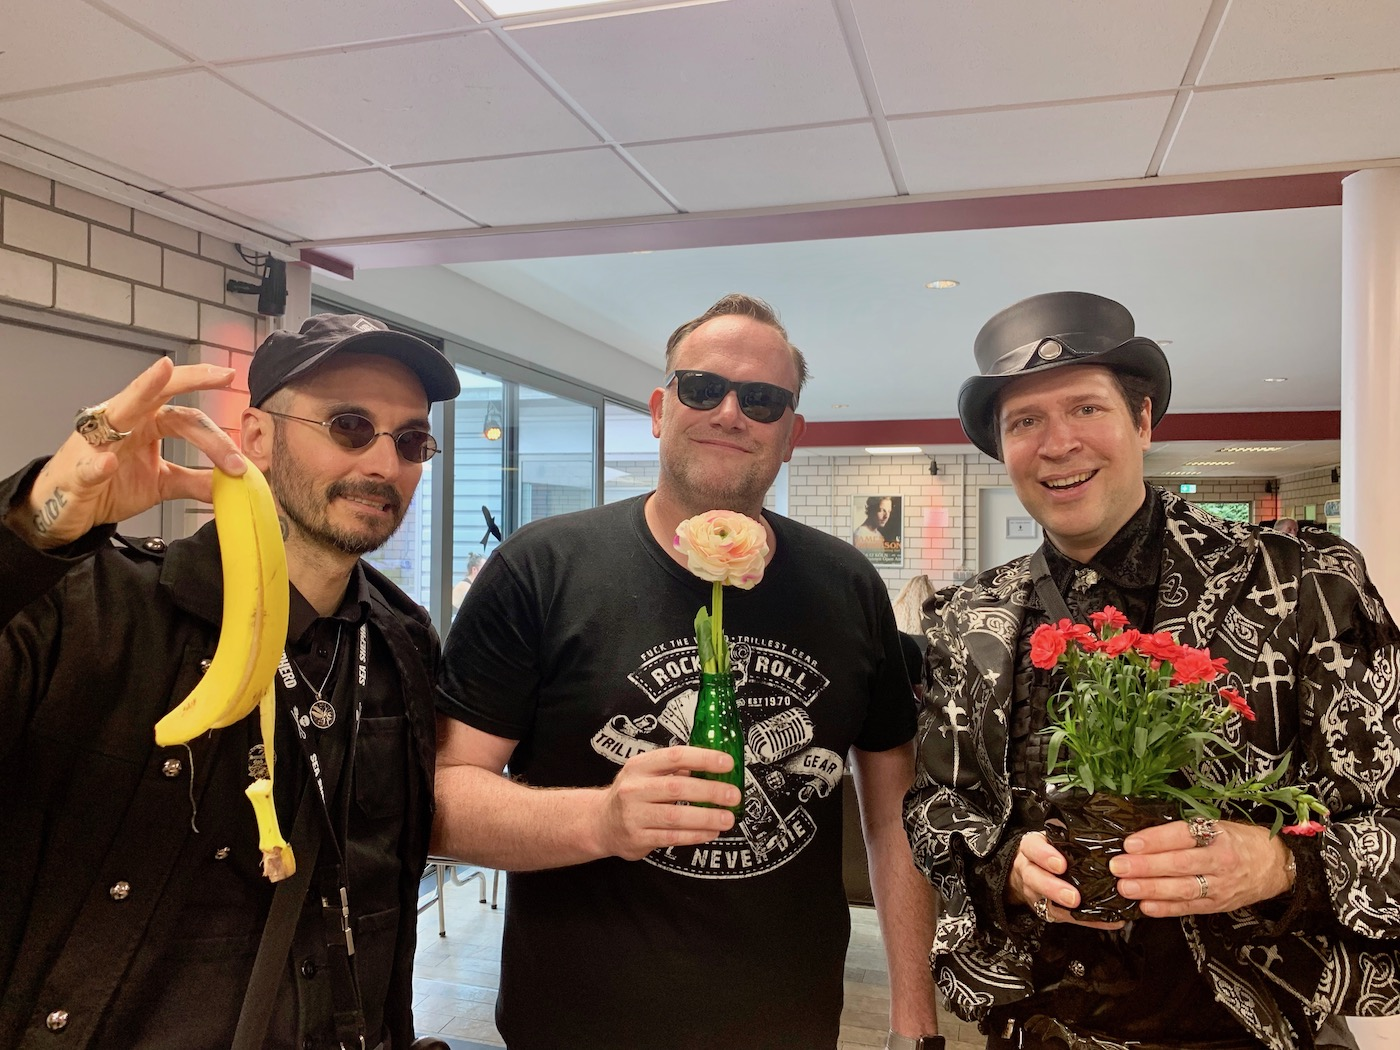 mark_benecke_amphi_festival_koeln_2019 - 25.jpg